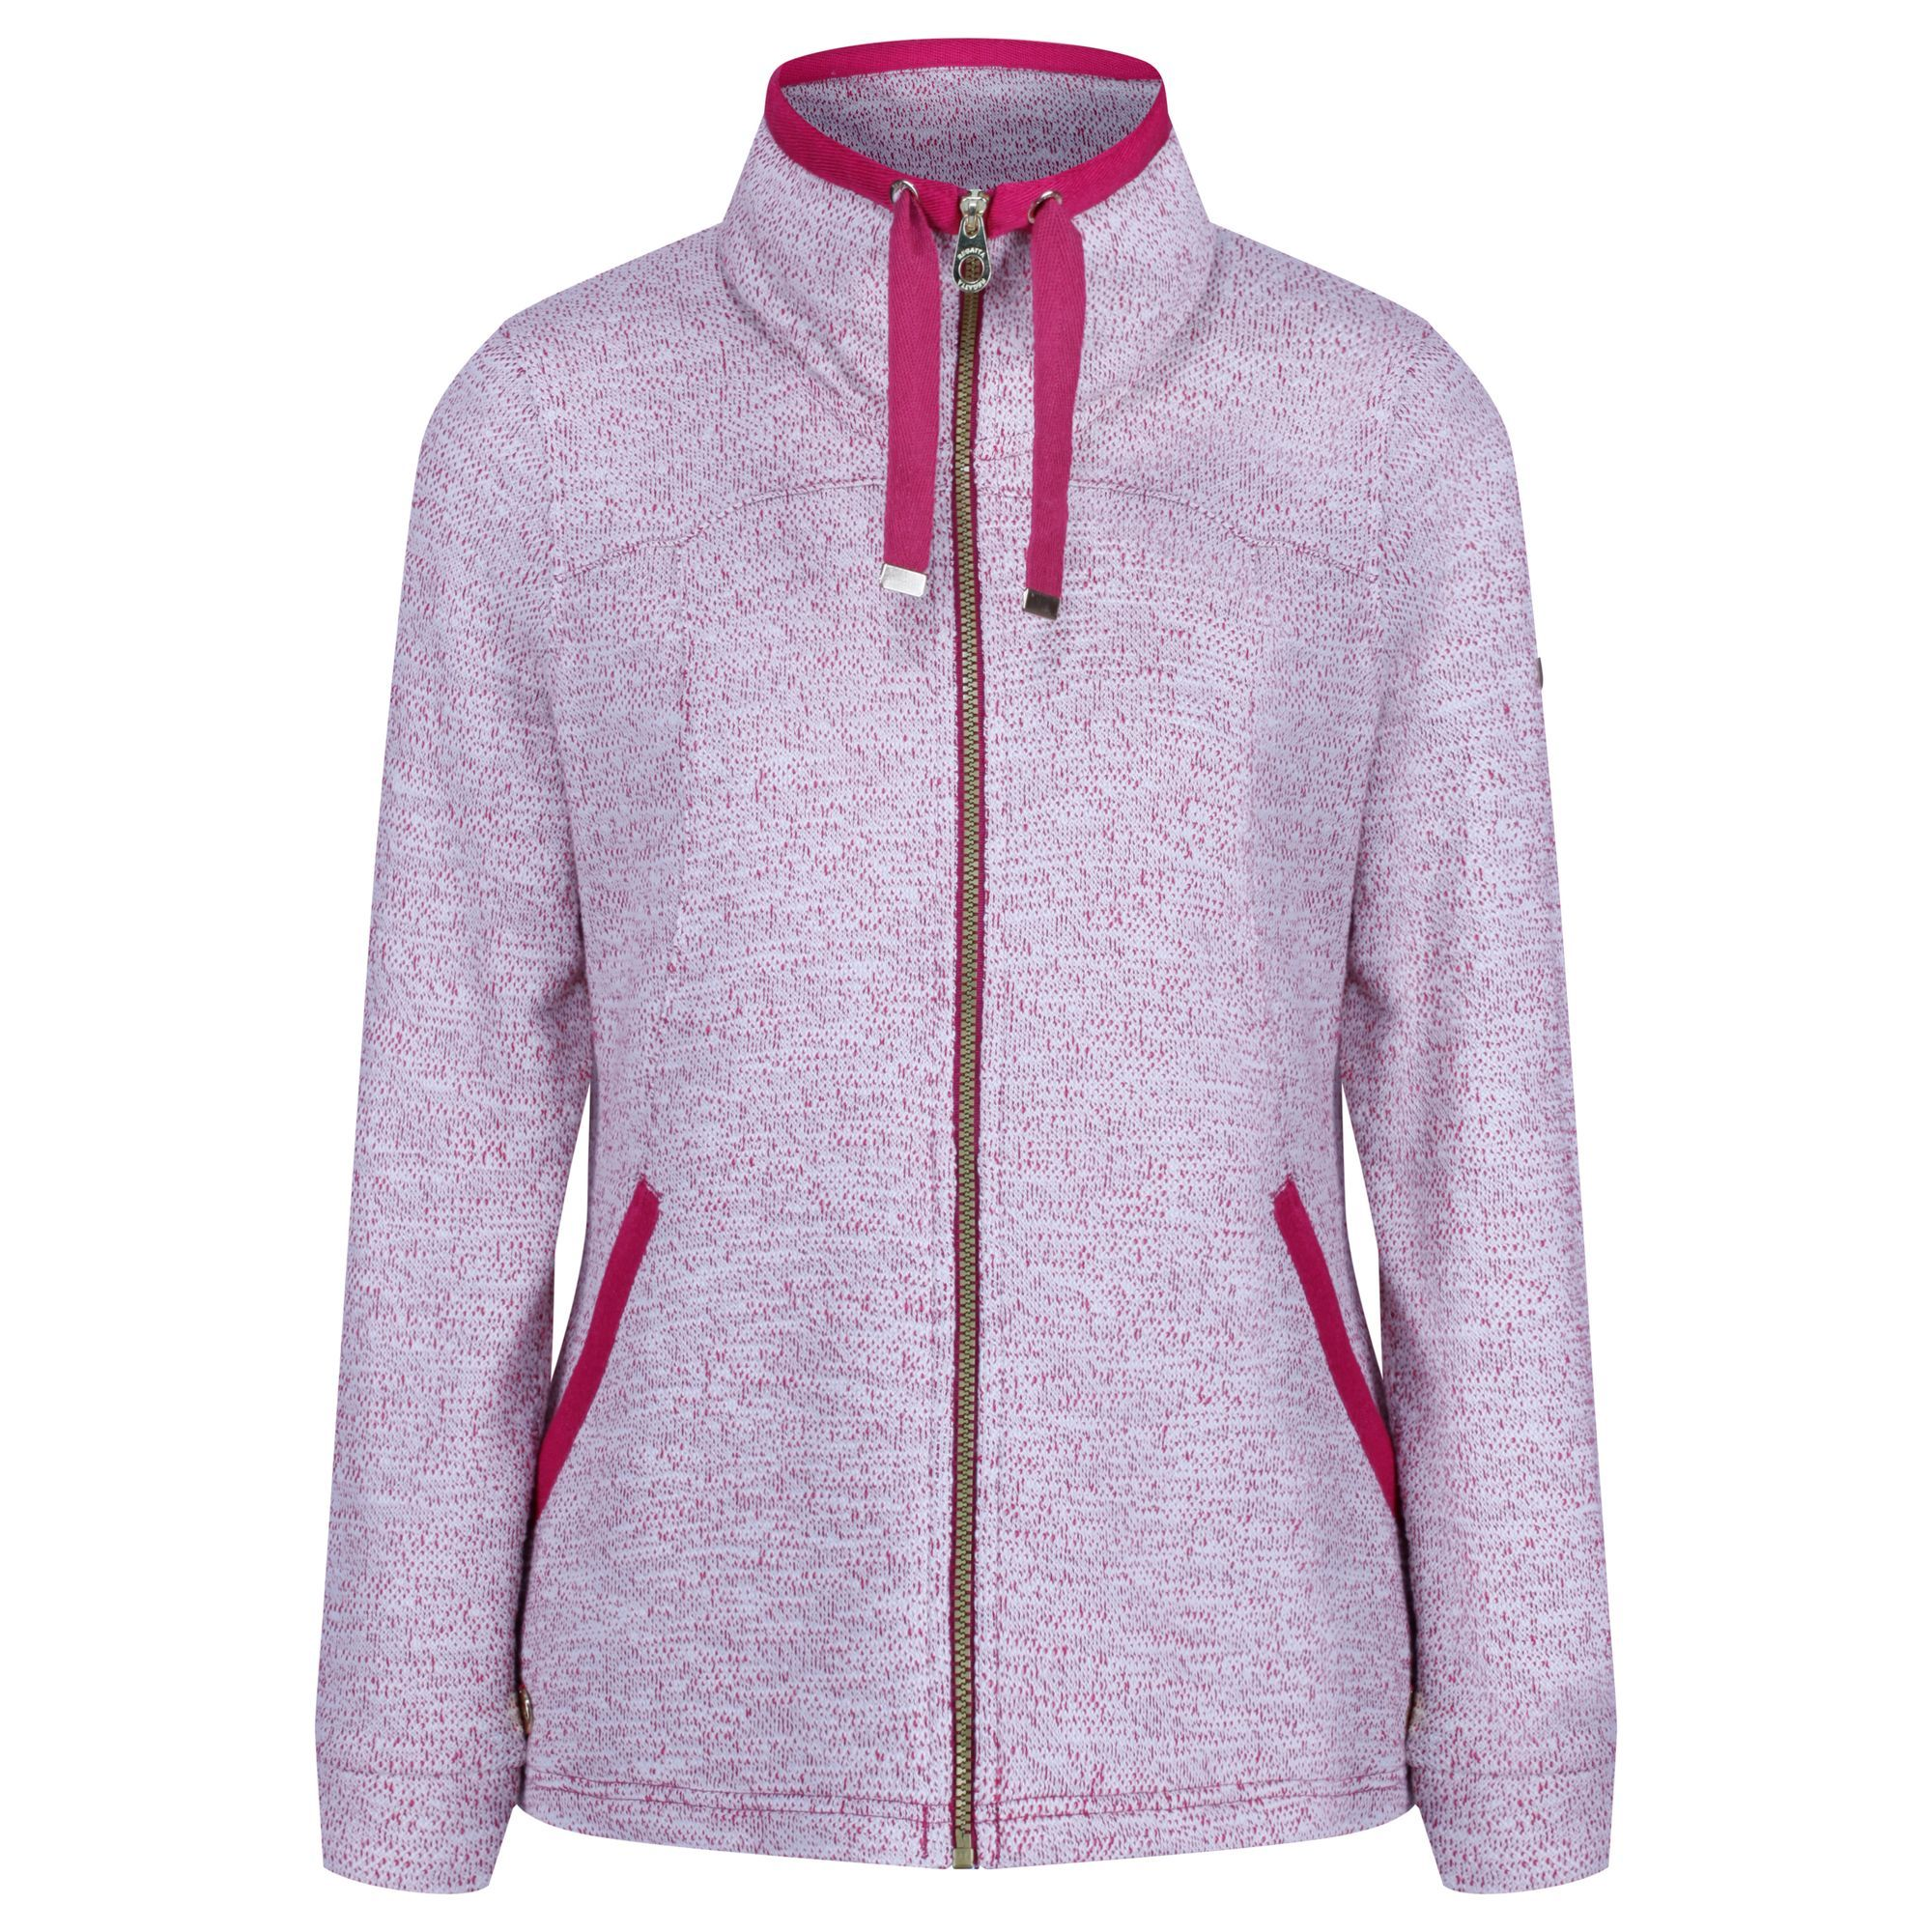 Regatta-Odetta-Womens-Warm-Curved-Full-Zip-Fleece-Jacket-RRP-50 thumbnail 20